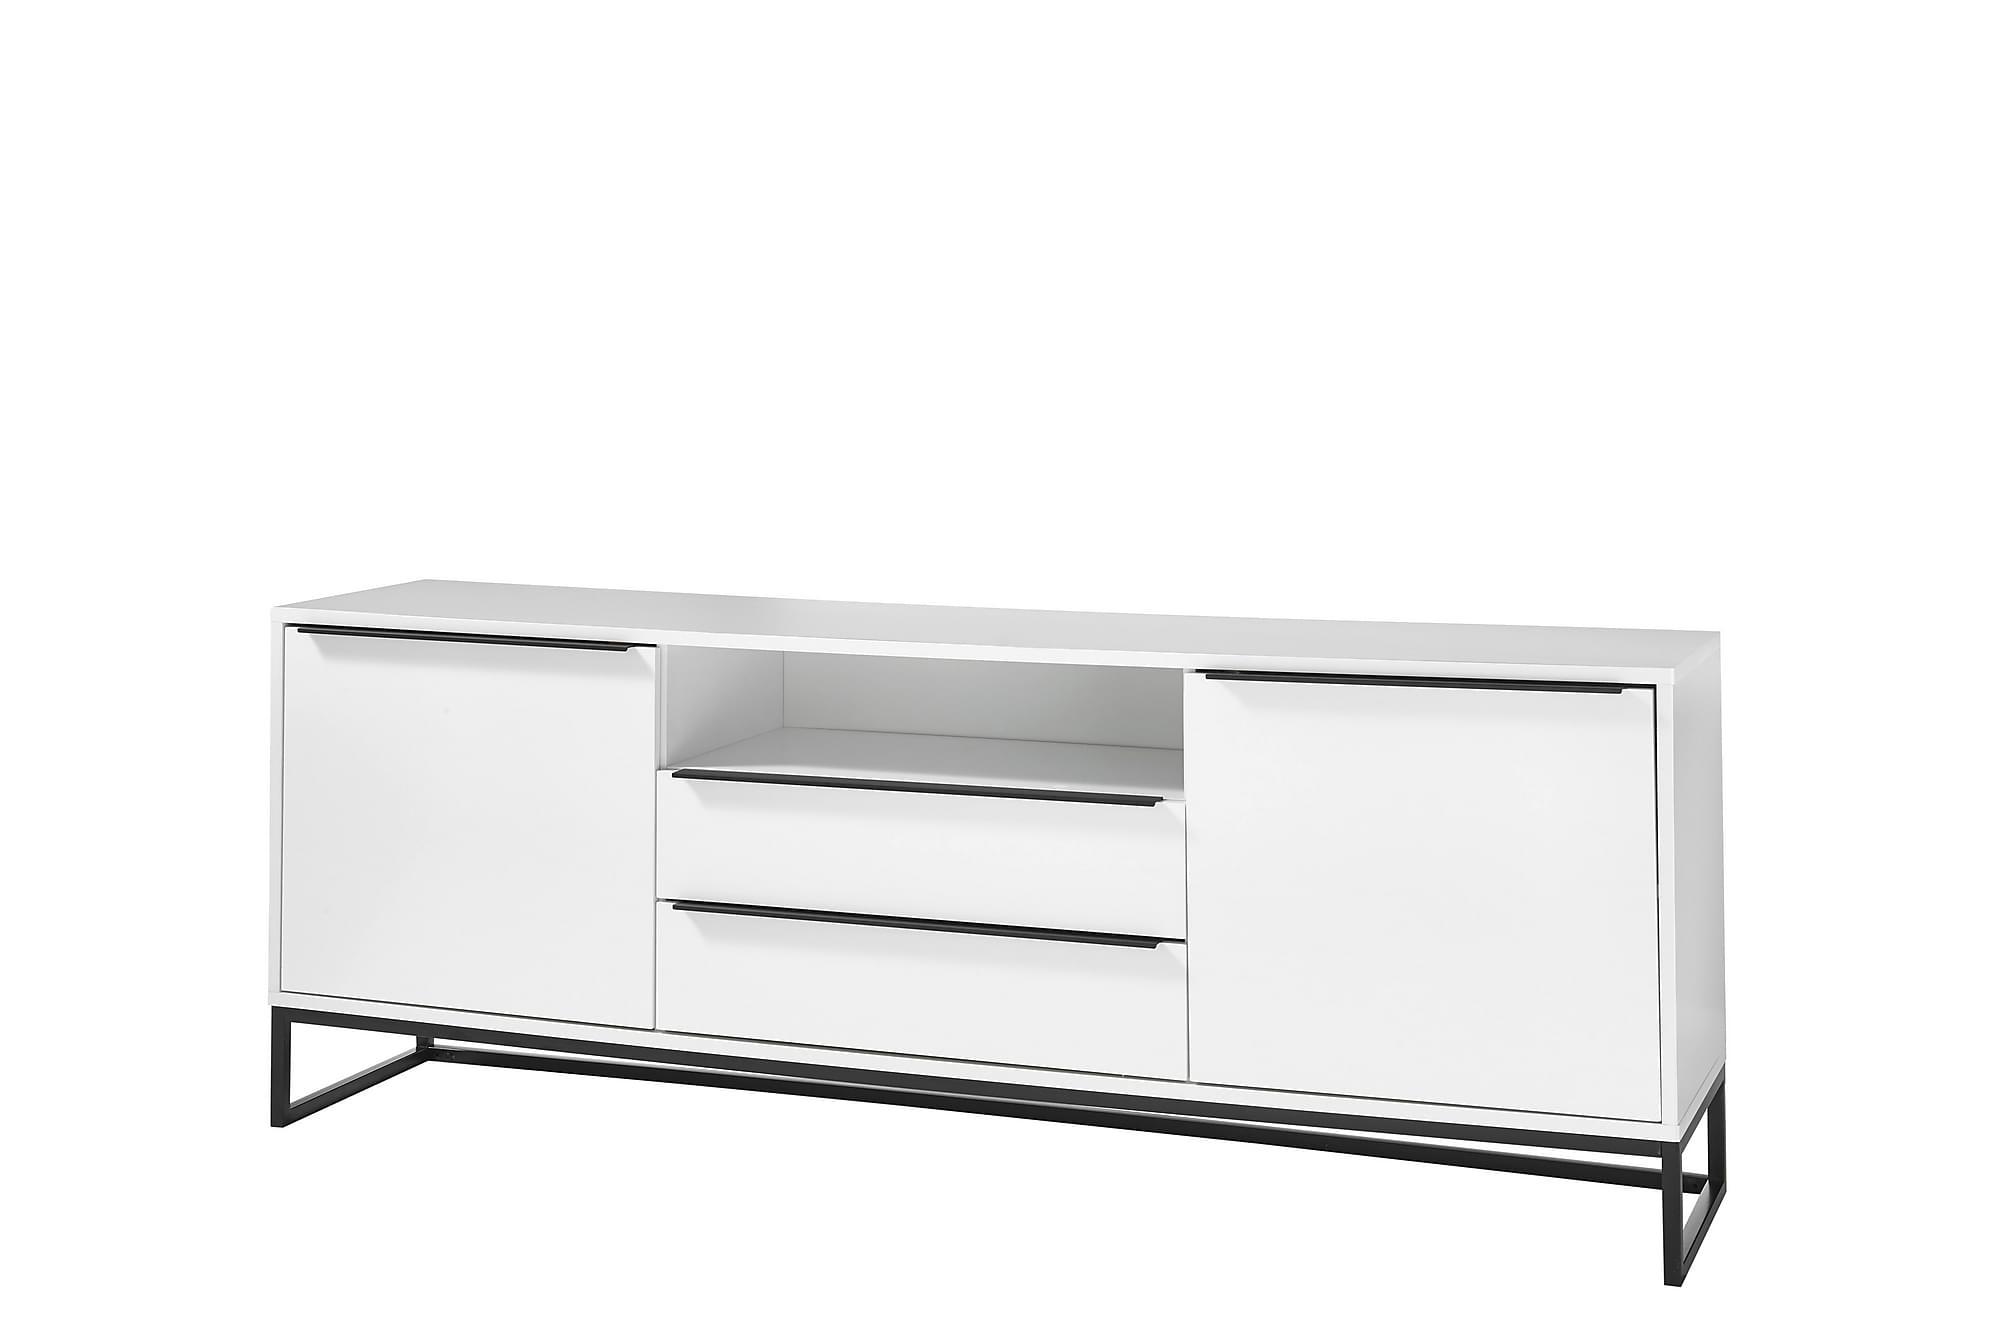 AGURKIS Lowboard 184 cm Vit|Svart, Sideboards